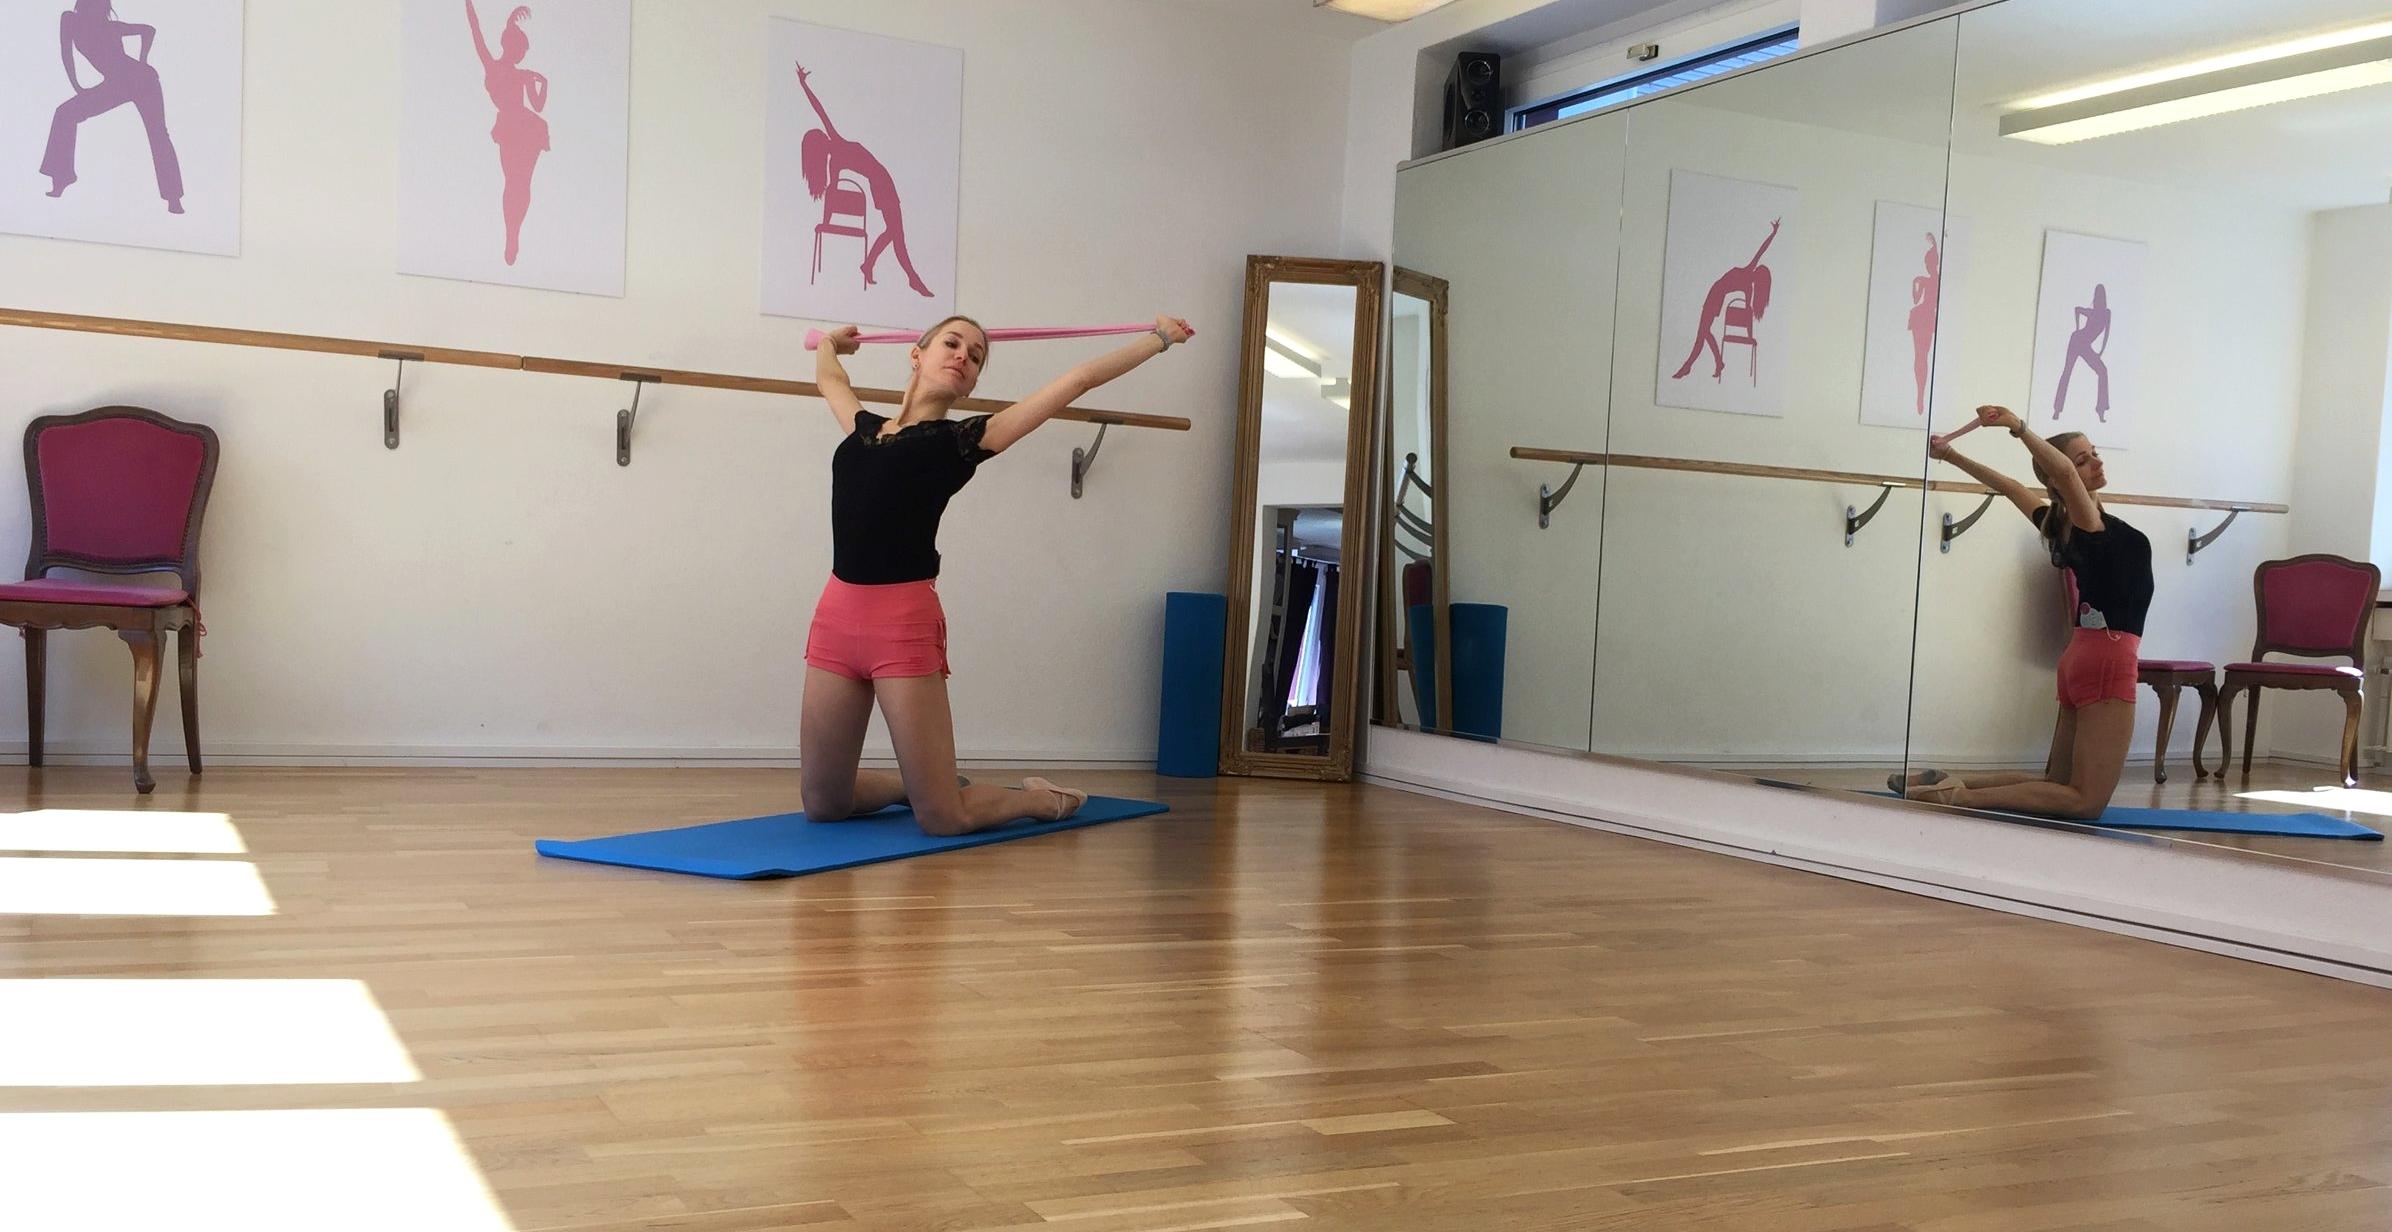 ballet-body-sculpture-flexibility-classes